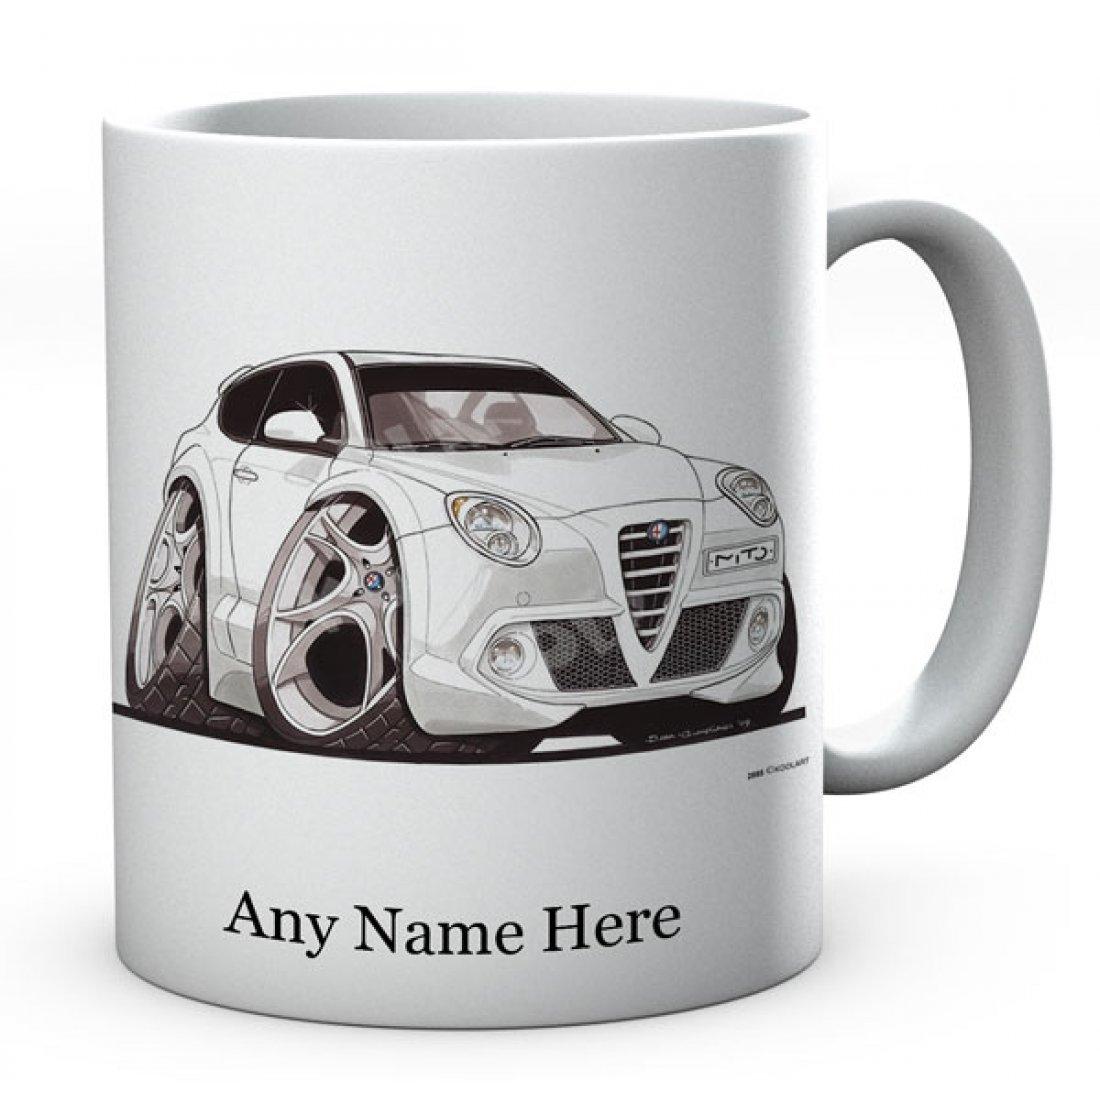 Personalised Koolart  Mito White (2885) Ceramic Mug